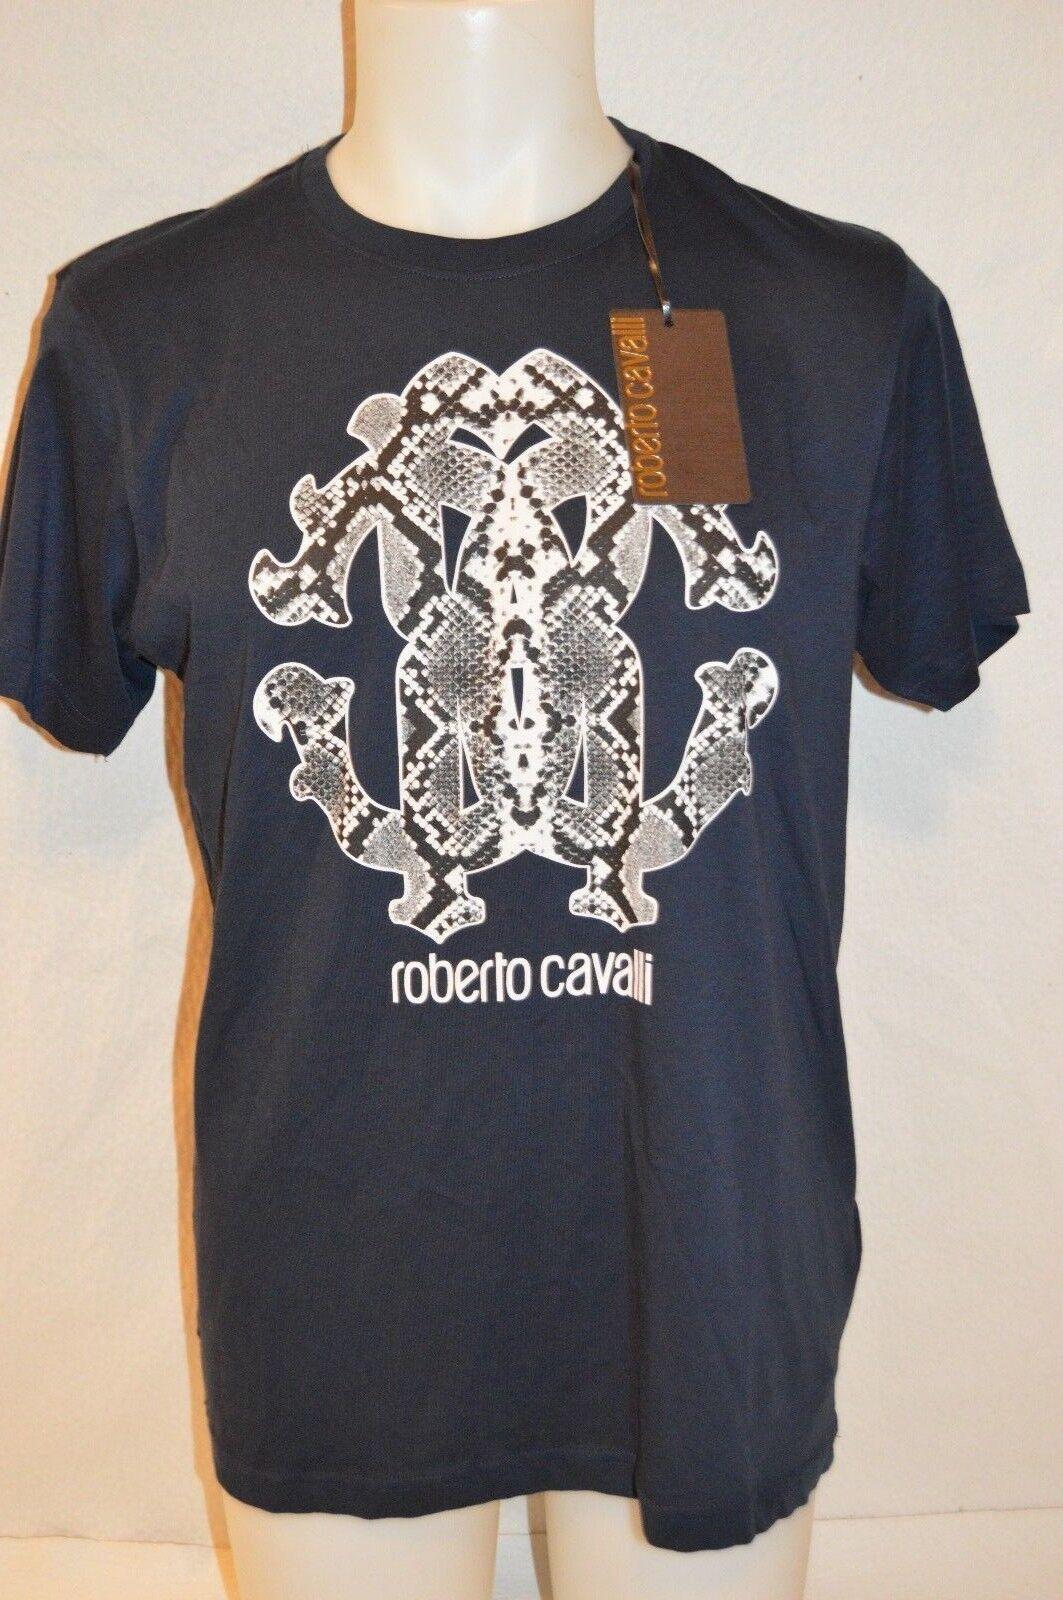 ROBERTO CAVALLI Man's Graphic Snake Print T-shirt Size X-Large NEW Retail